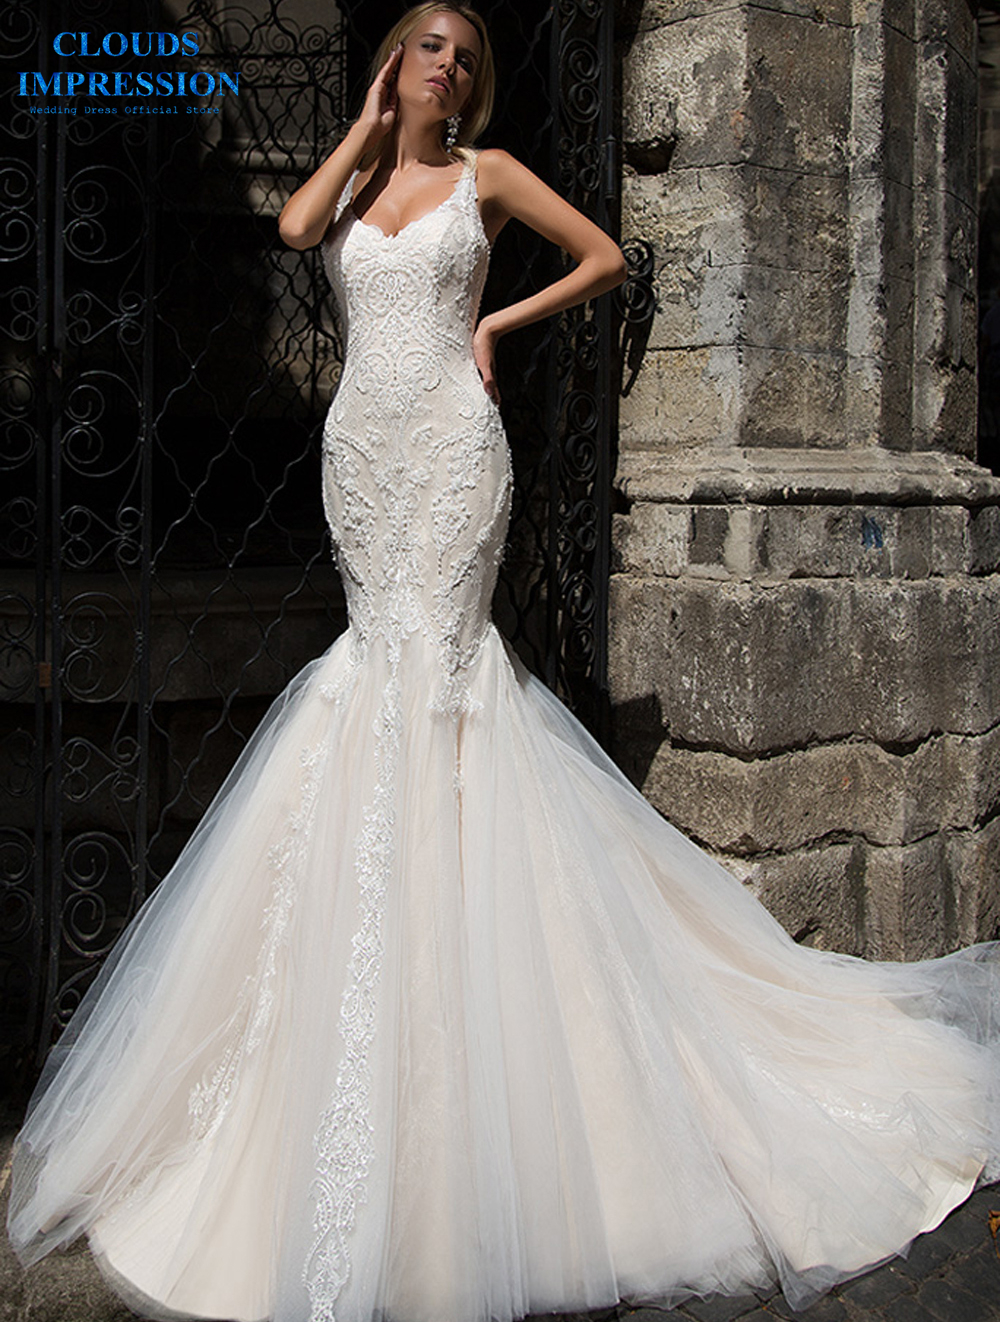 CLOUDS IMPRESSION Sexy 2019 Sweetheart Wedding Dress Mermaid Lace Beading Appliques Bridal Gowns Bride Dress Vestige De Noiva